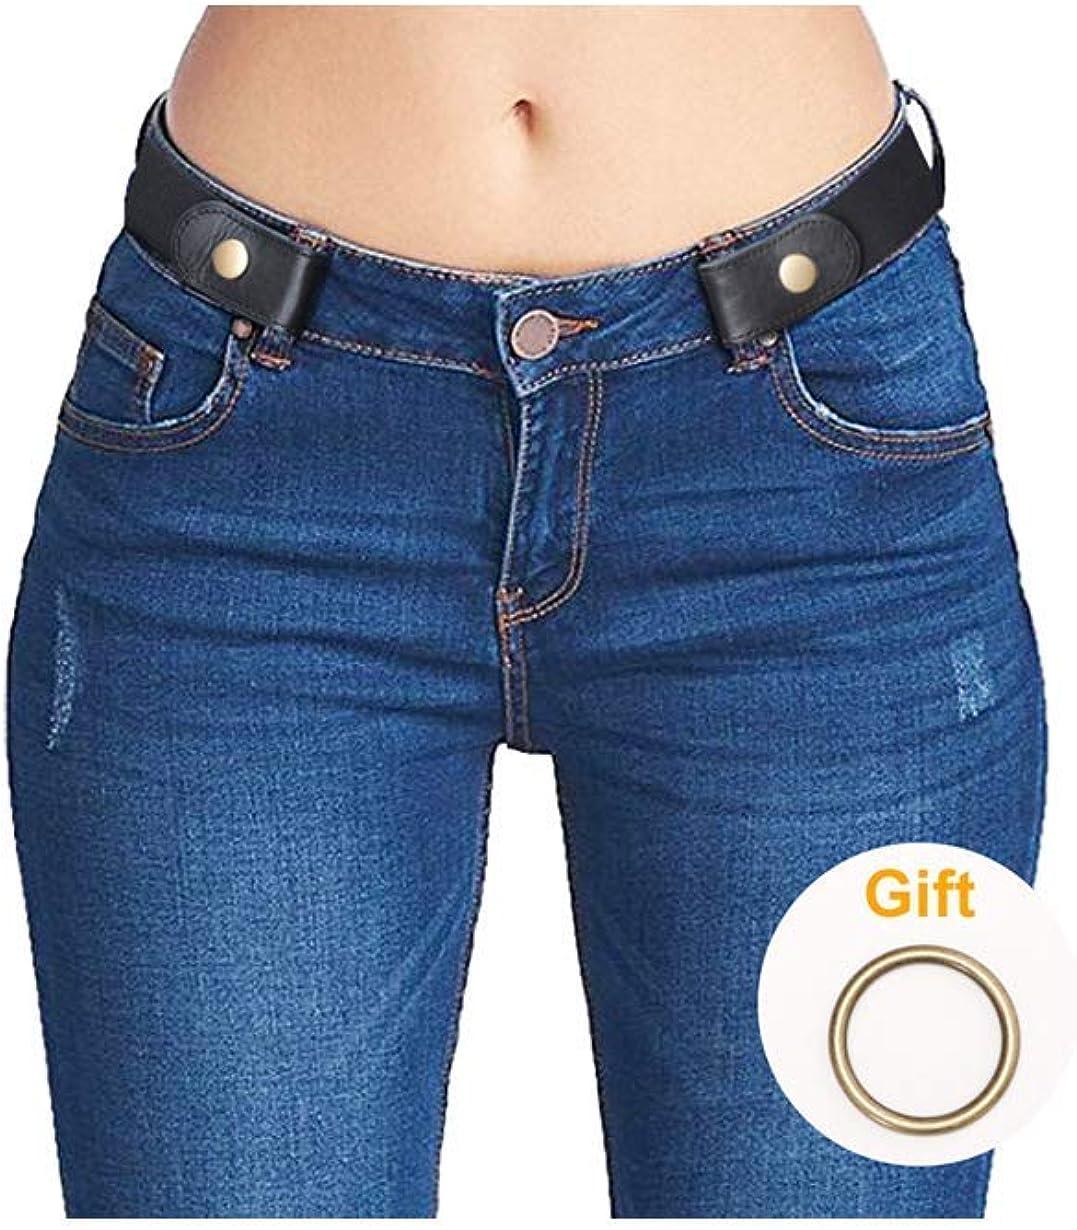 No Buckle Stretch Belt For Women Elastic Waist Belt for Jeans Pants Dresses S...